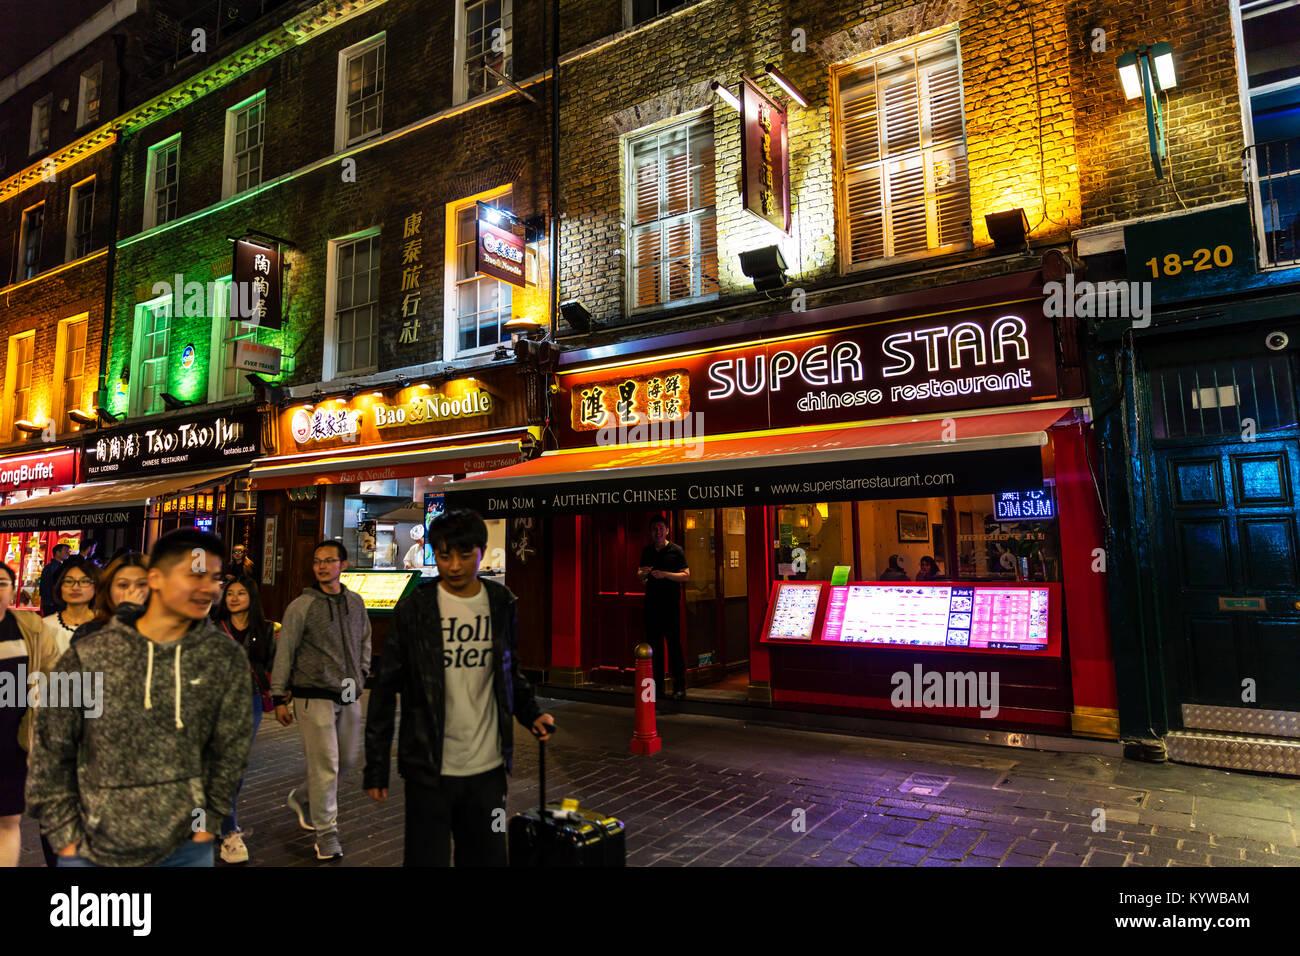 China Town London at night, China Town London UK, China Town London, China Town, China Town restaurants London UK, - Stock Image